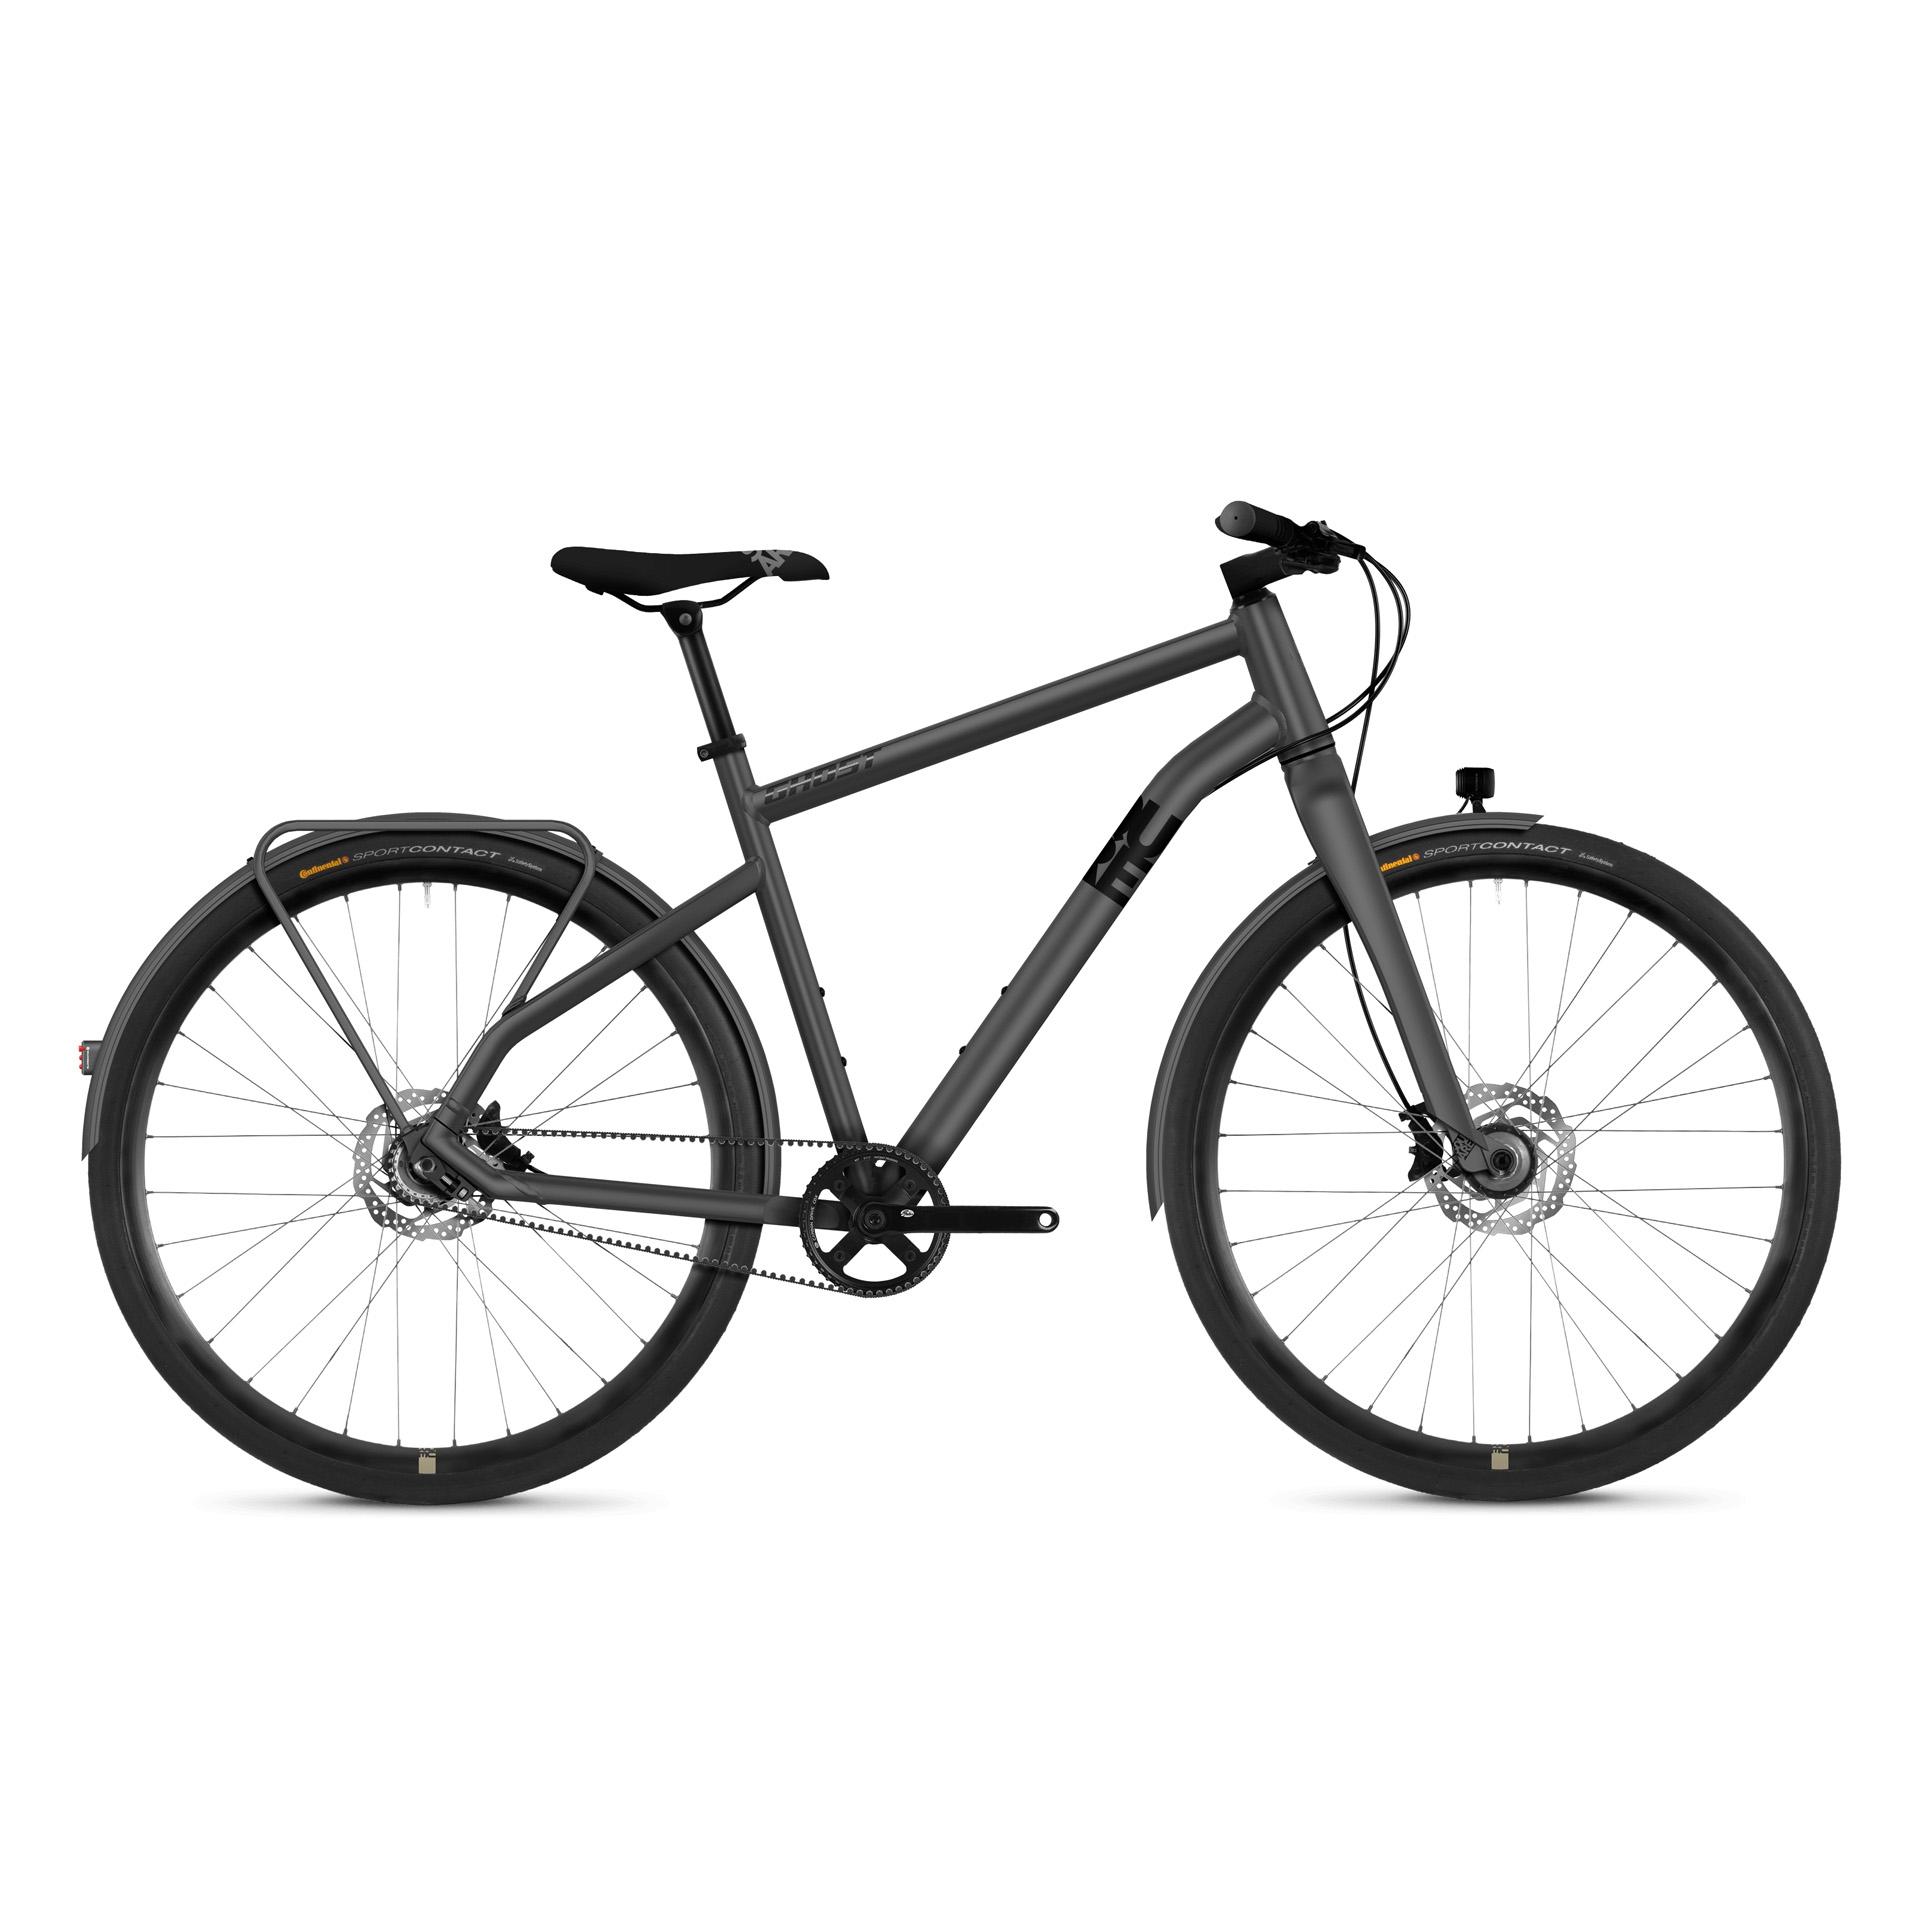 Vélo urbain Ghost Square X 7.8 AL Gris - M